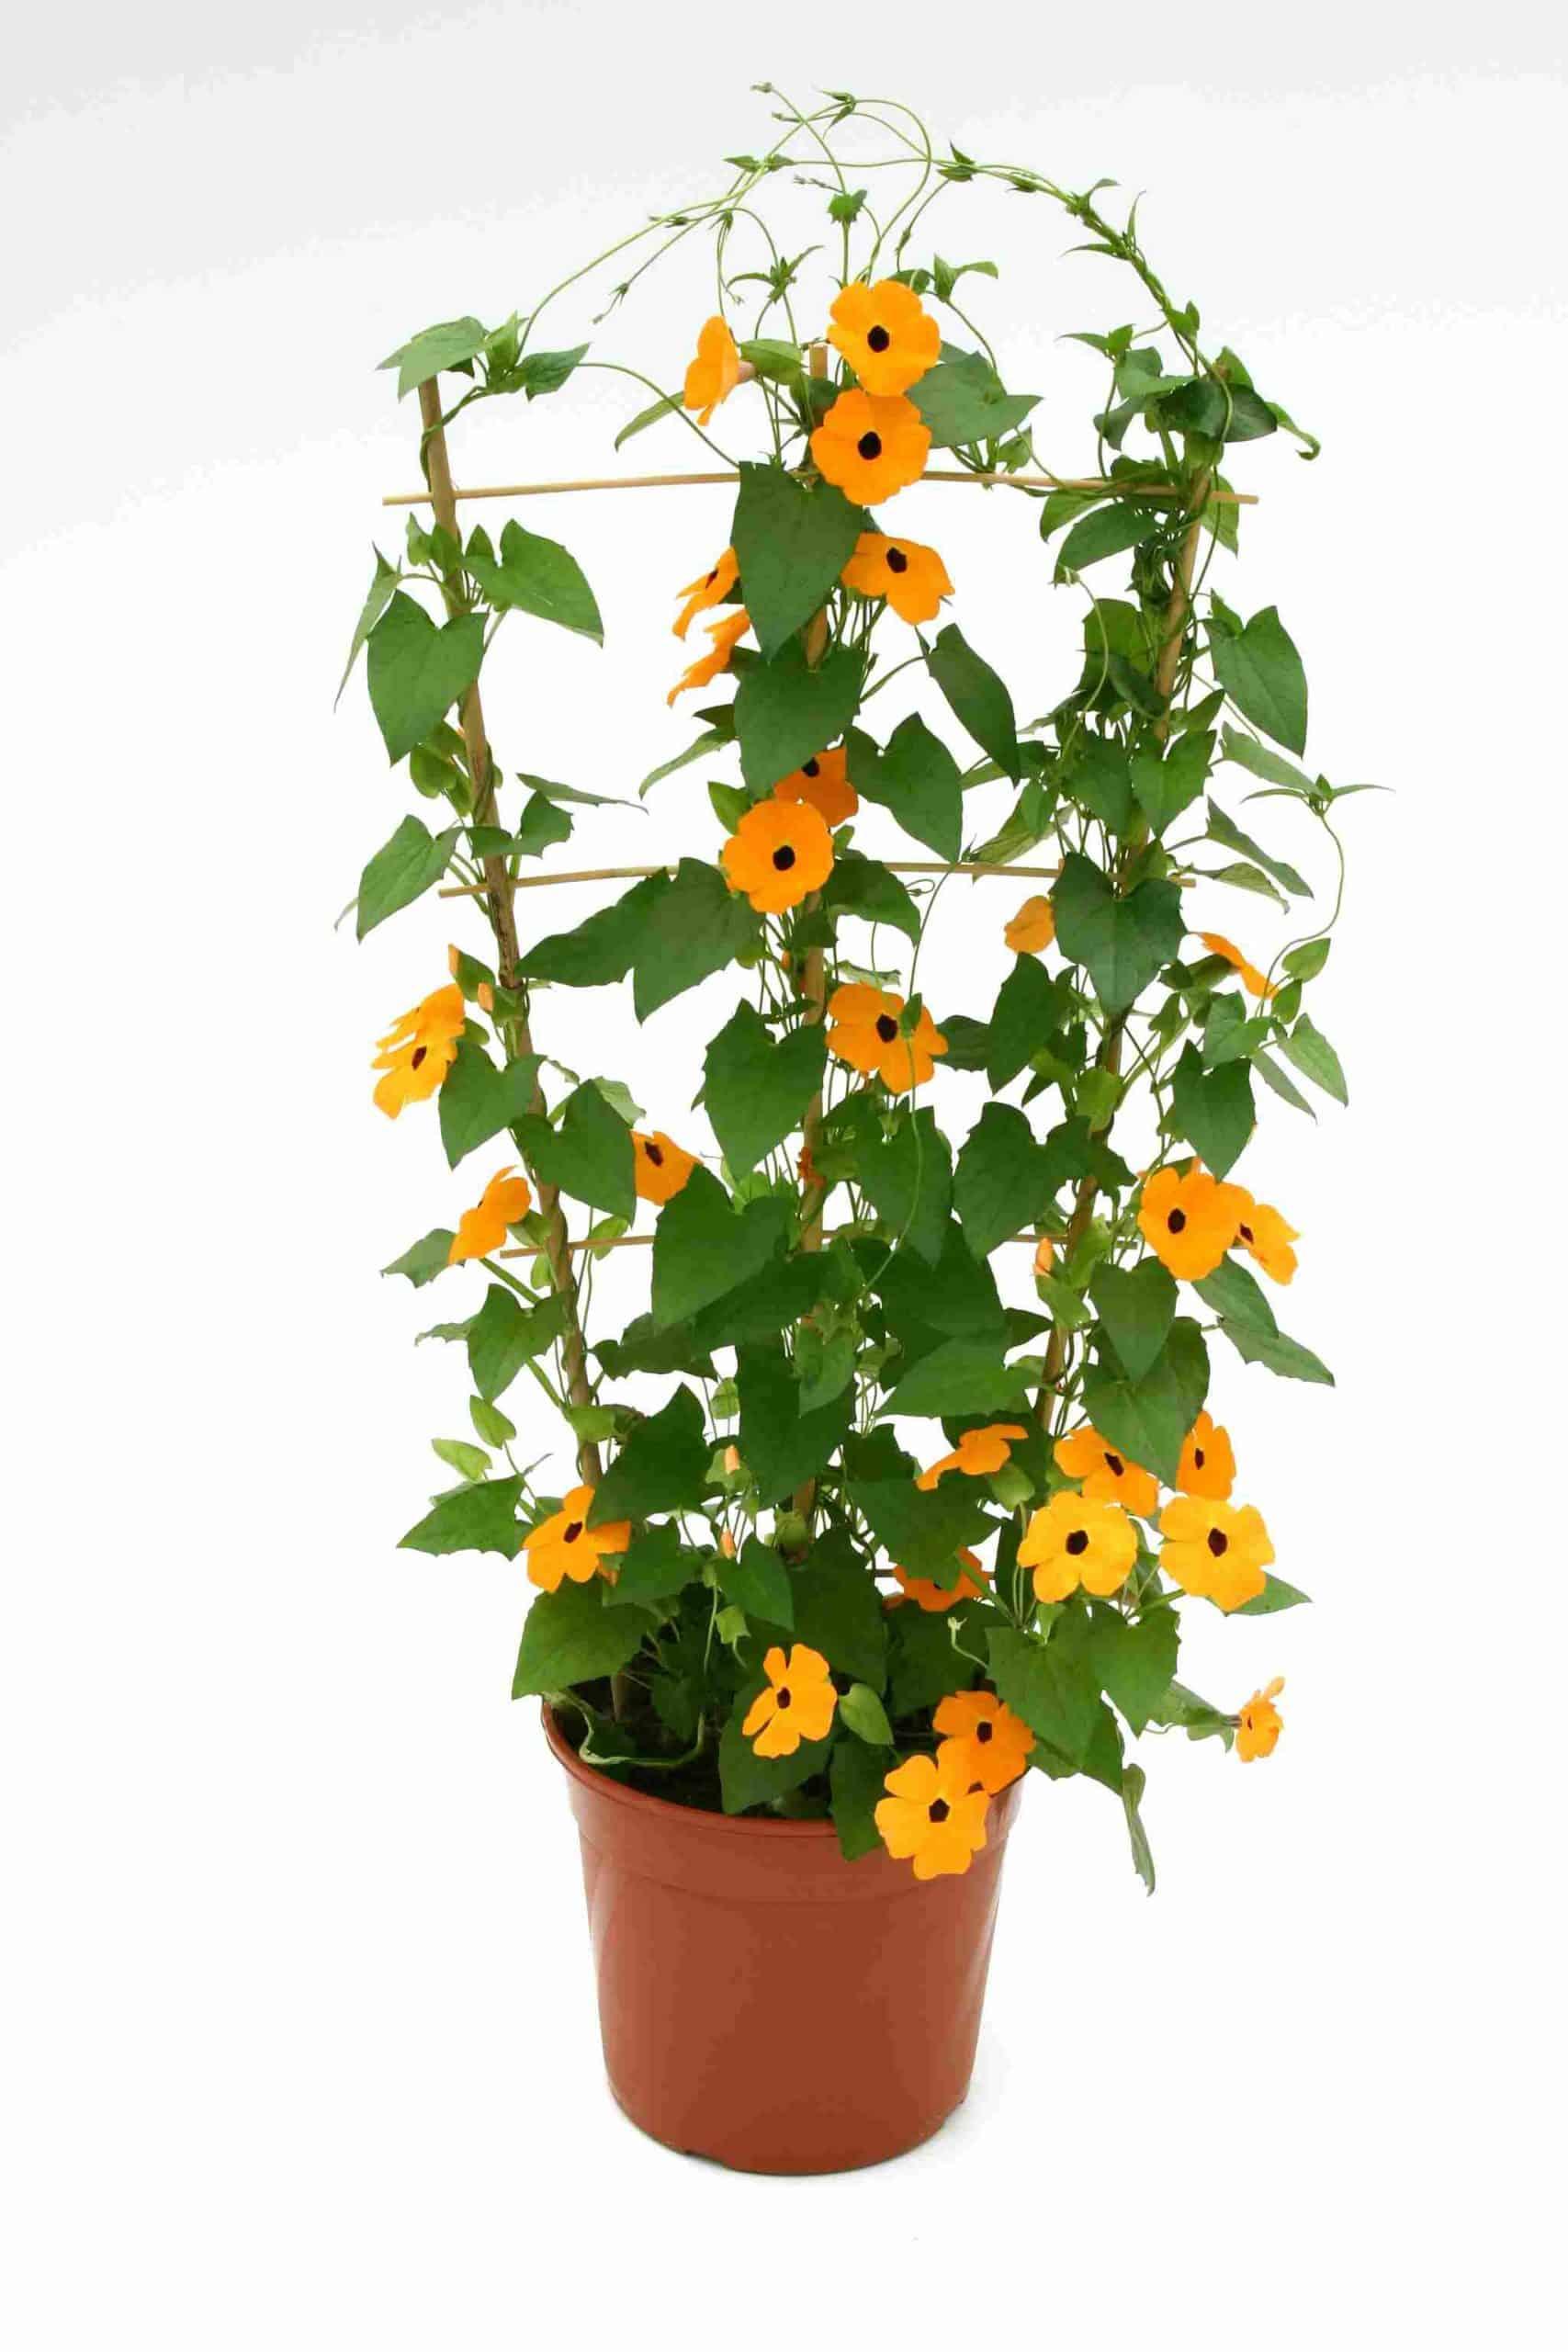 Thunbergia Orange Star